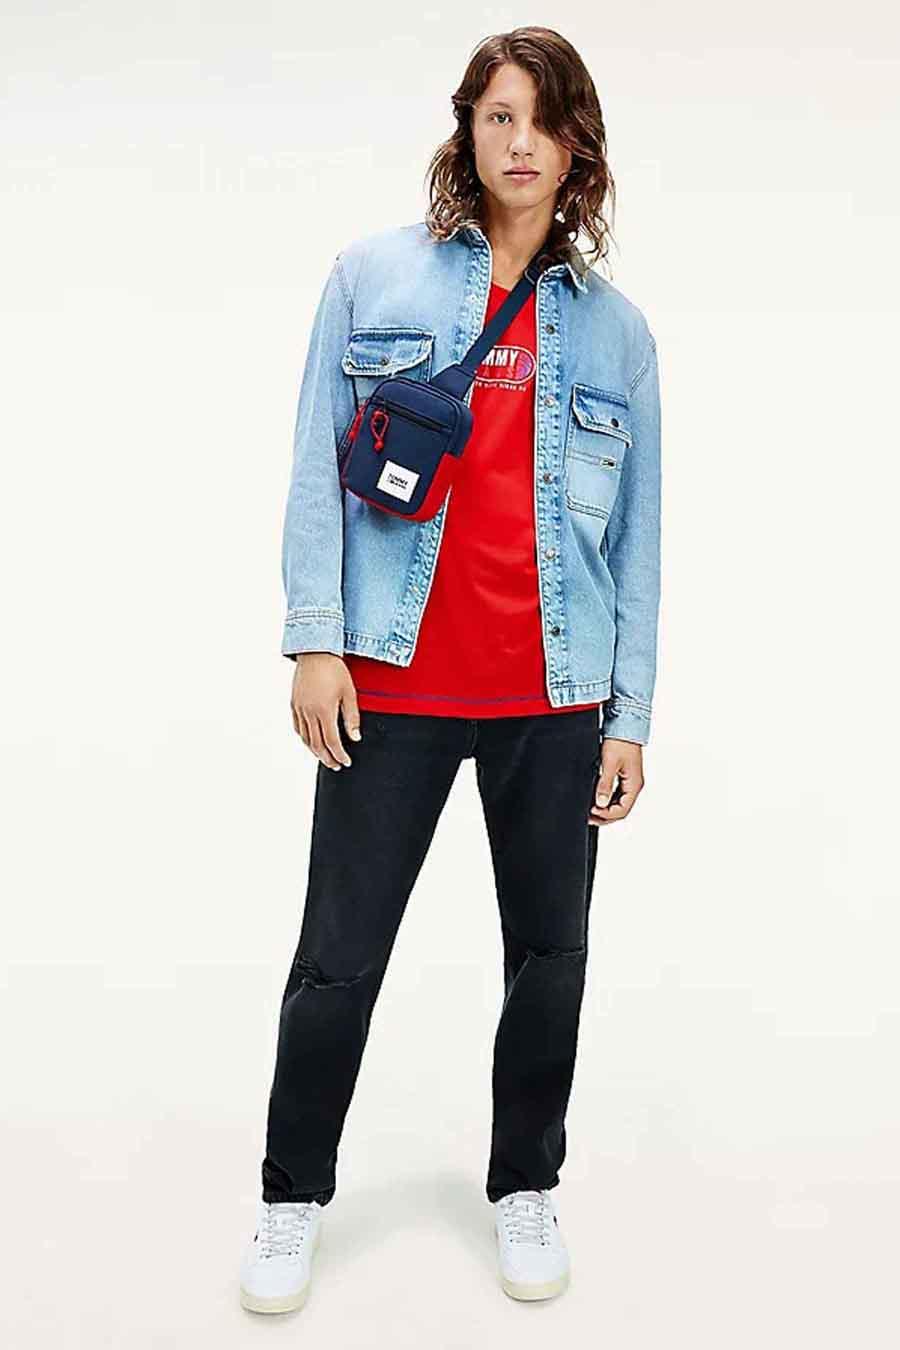 Tommy Hilfiger Jas jeans, Denim, Heren, Maat: L/M/S/XL/XS